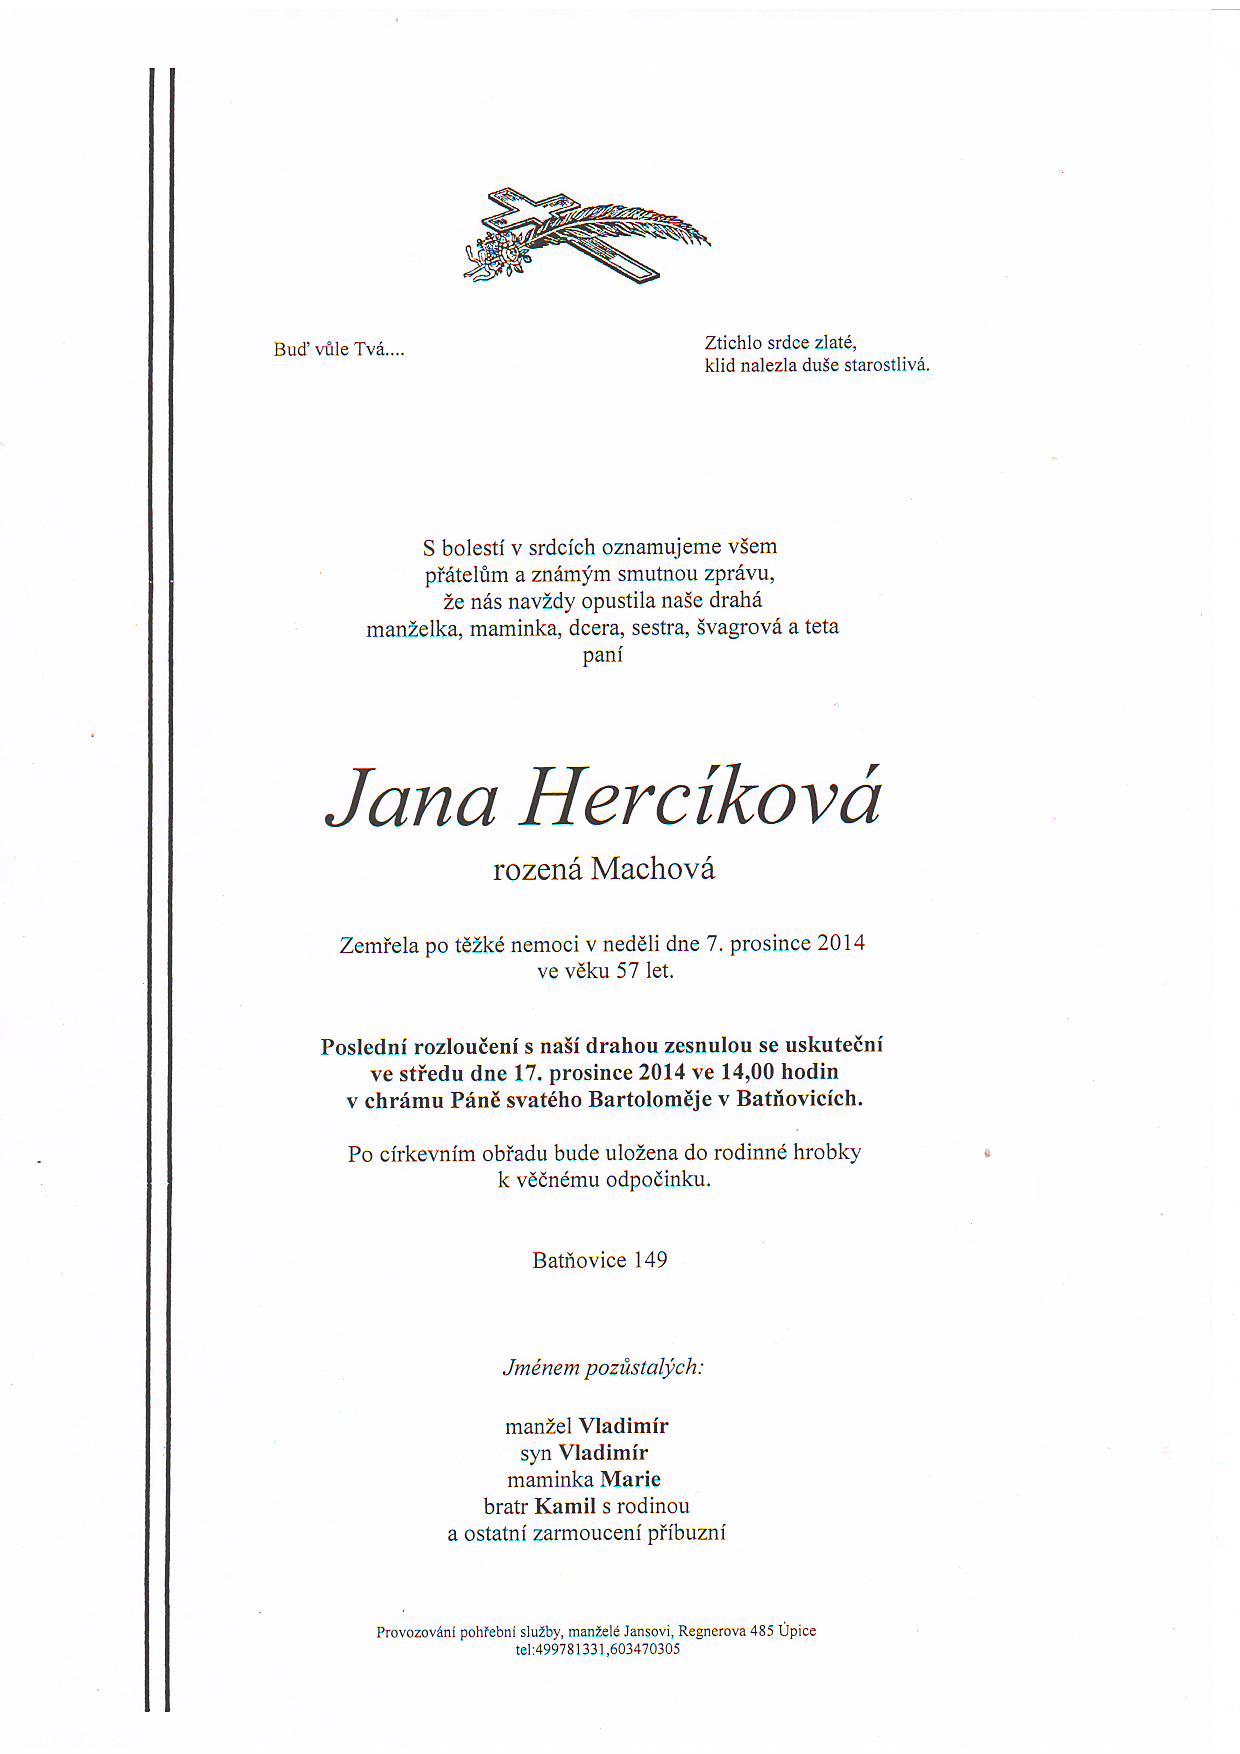 16_hercikova_jana